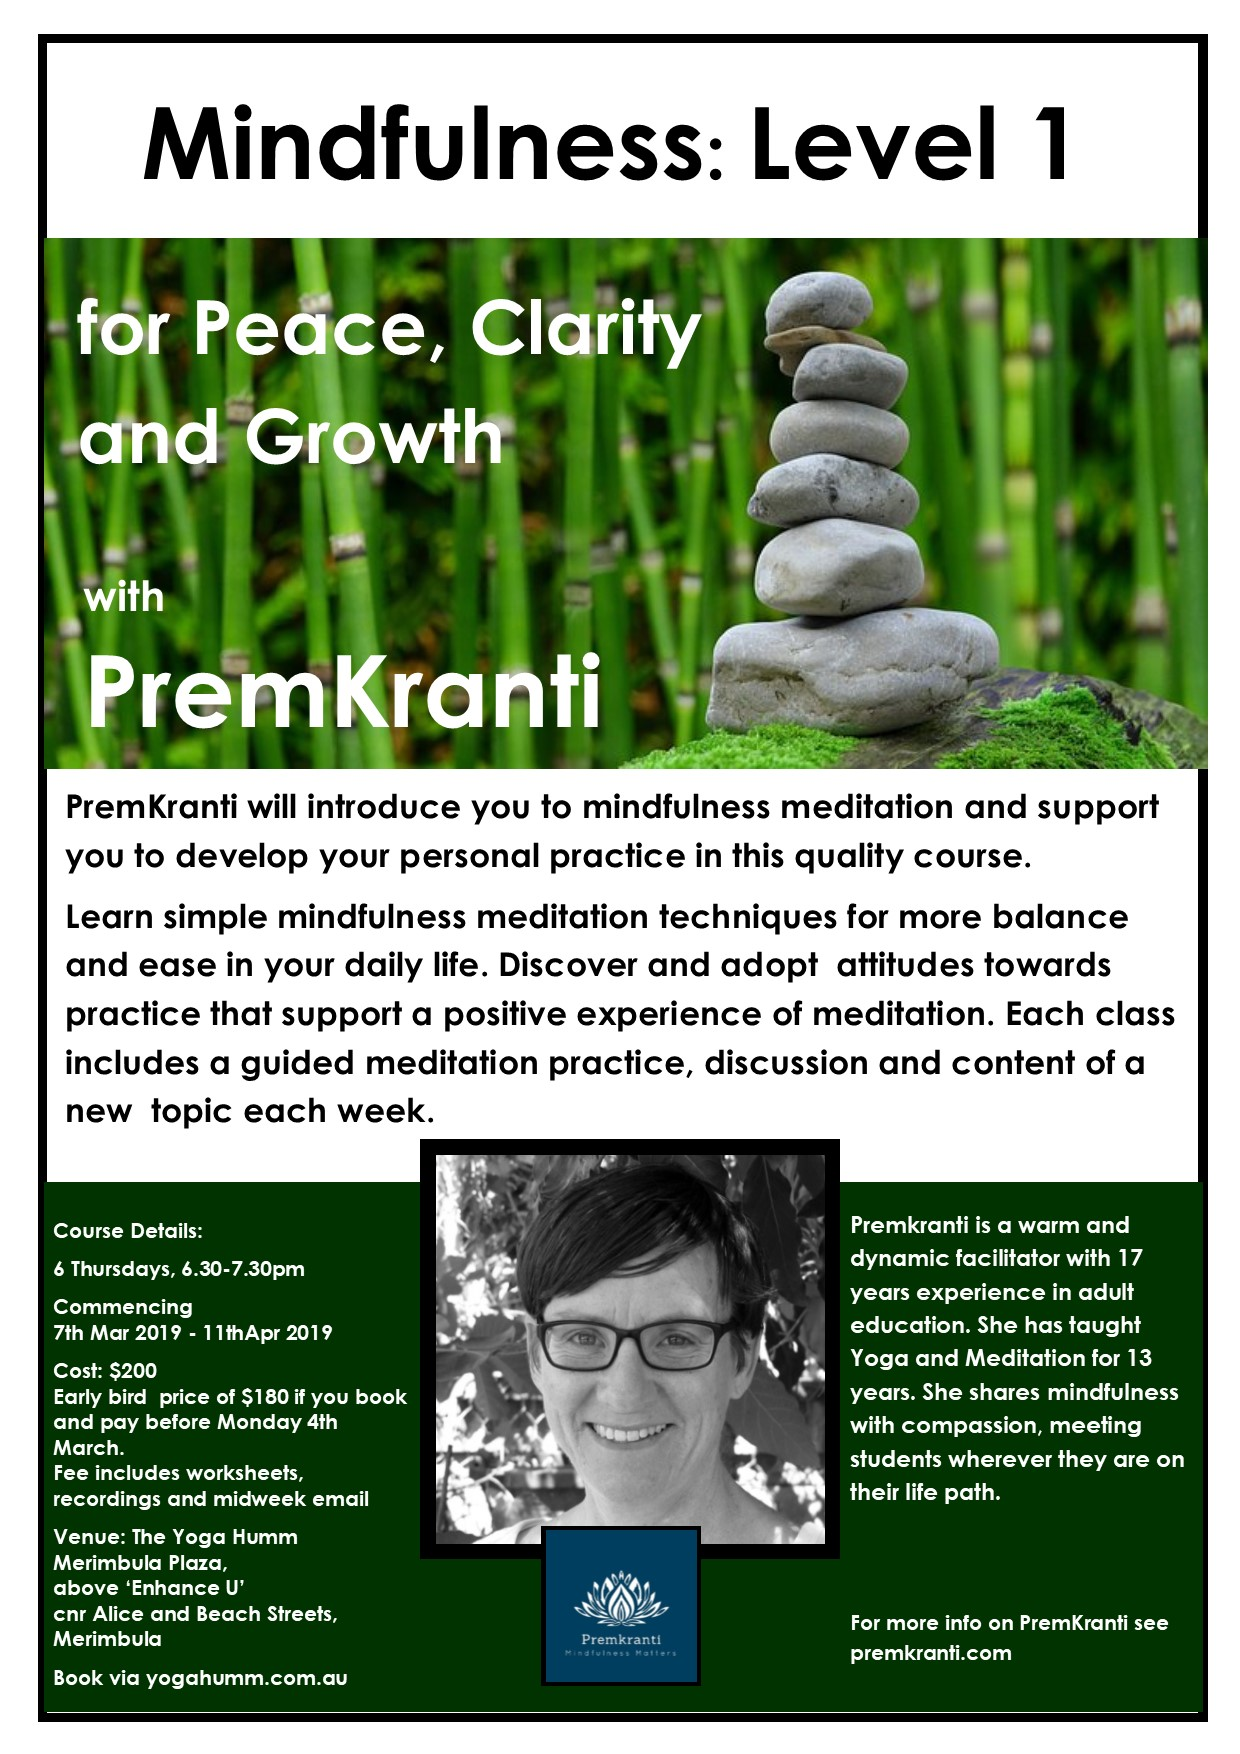 Mindfulness poster 2.jpg